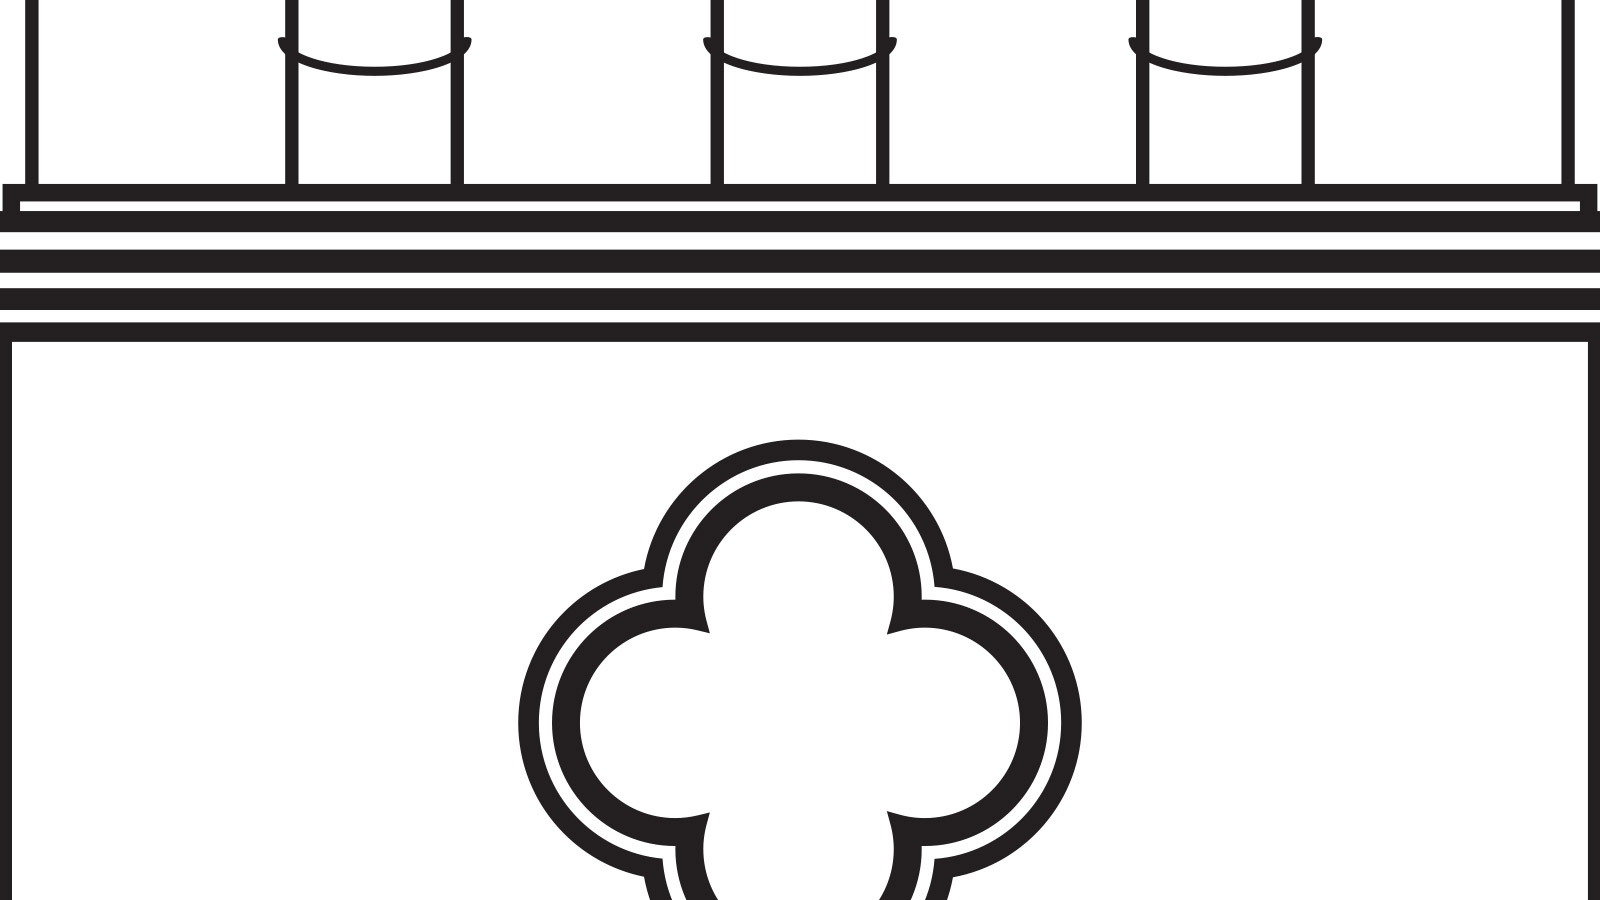 sublime-digital_branding_casa-del-coliseo-03